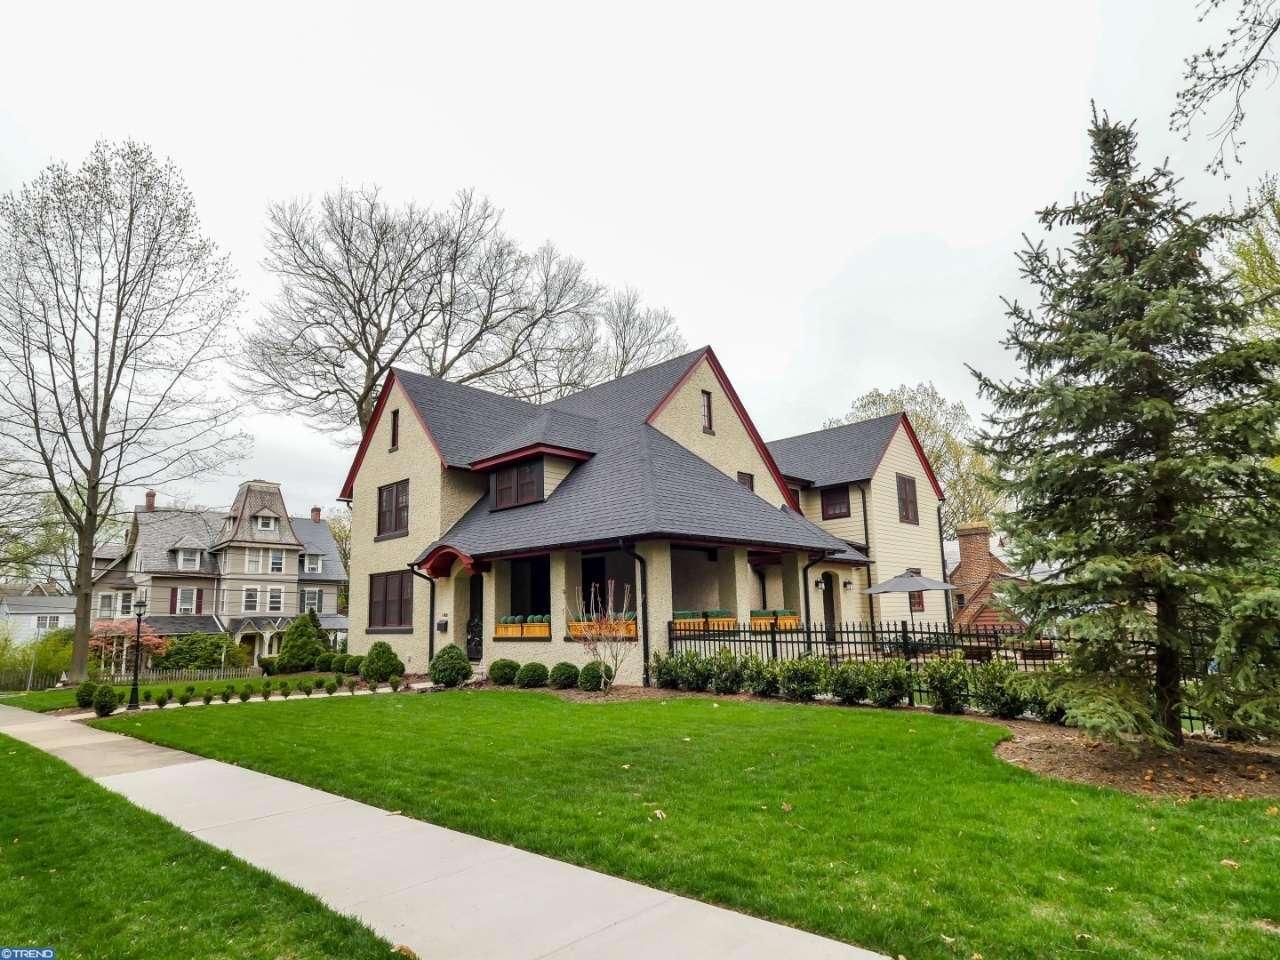 Single Family for Sale at 266 W Oakland Avenue Doylestown, Pennsylvania 18901 United States